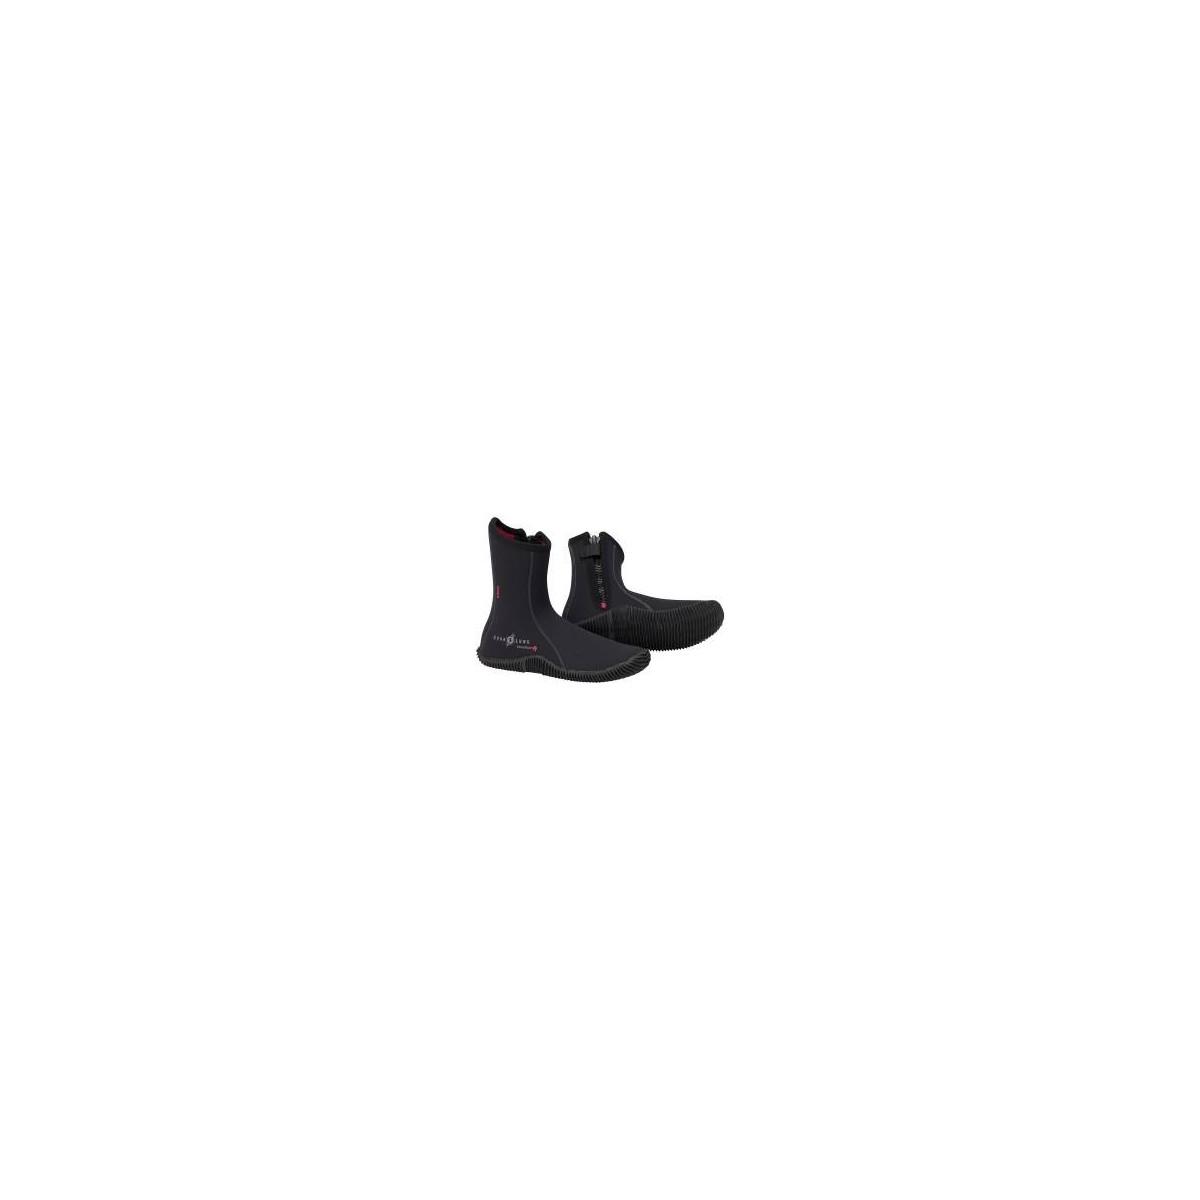 Aqua Lung Men's 7mm Echozip Ergo Boot